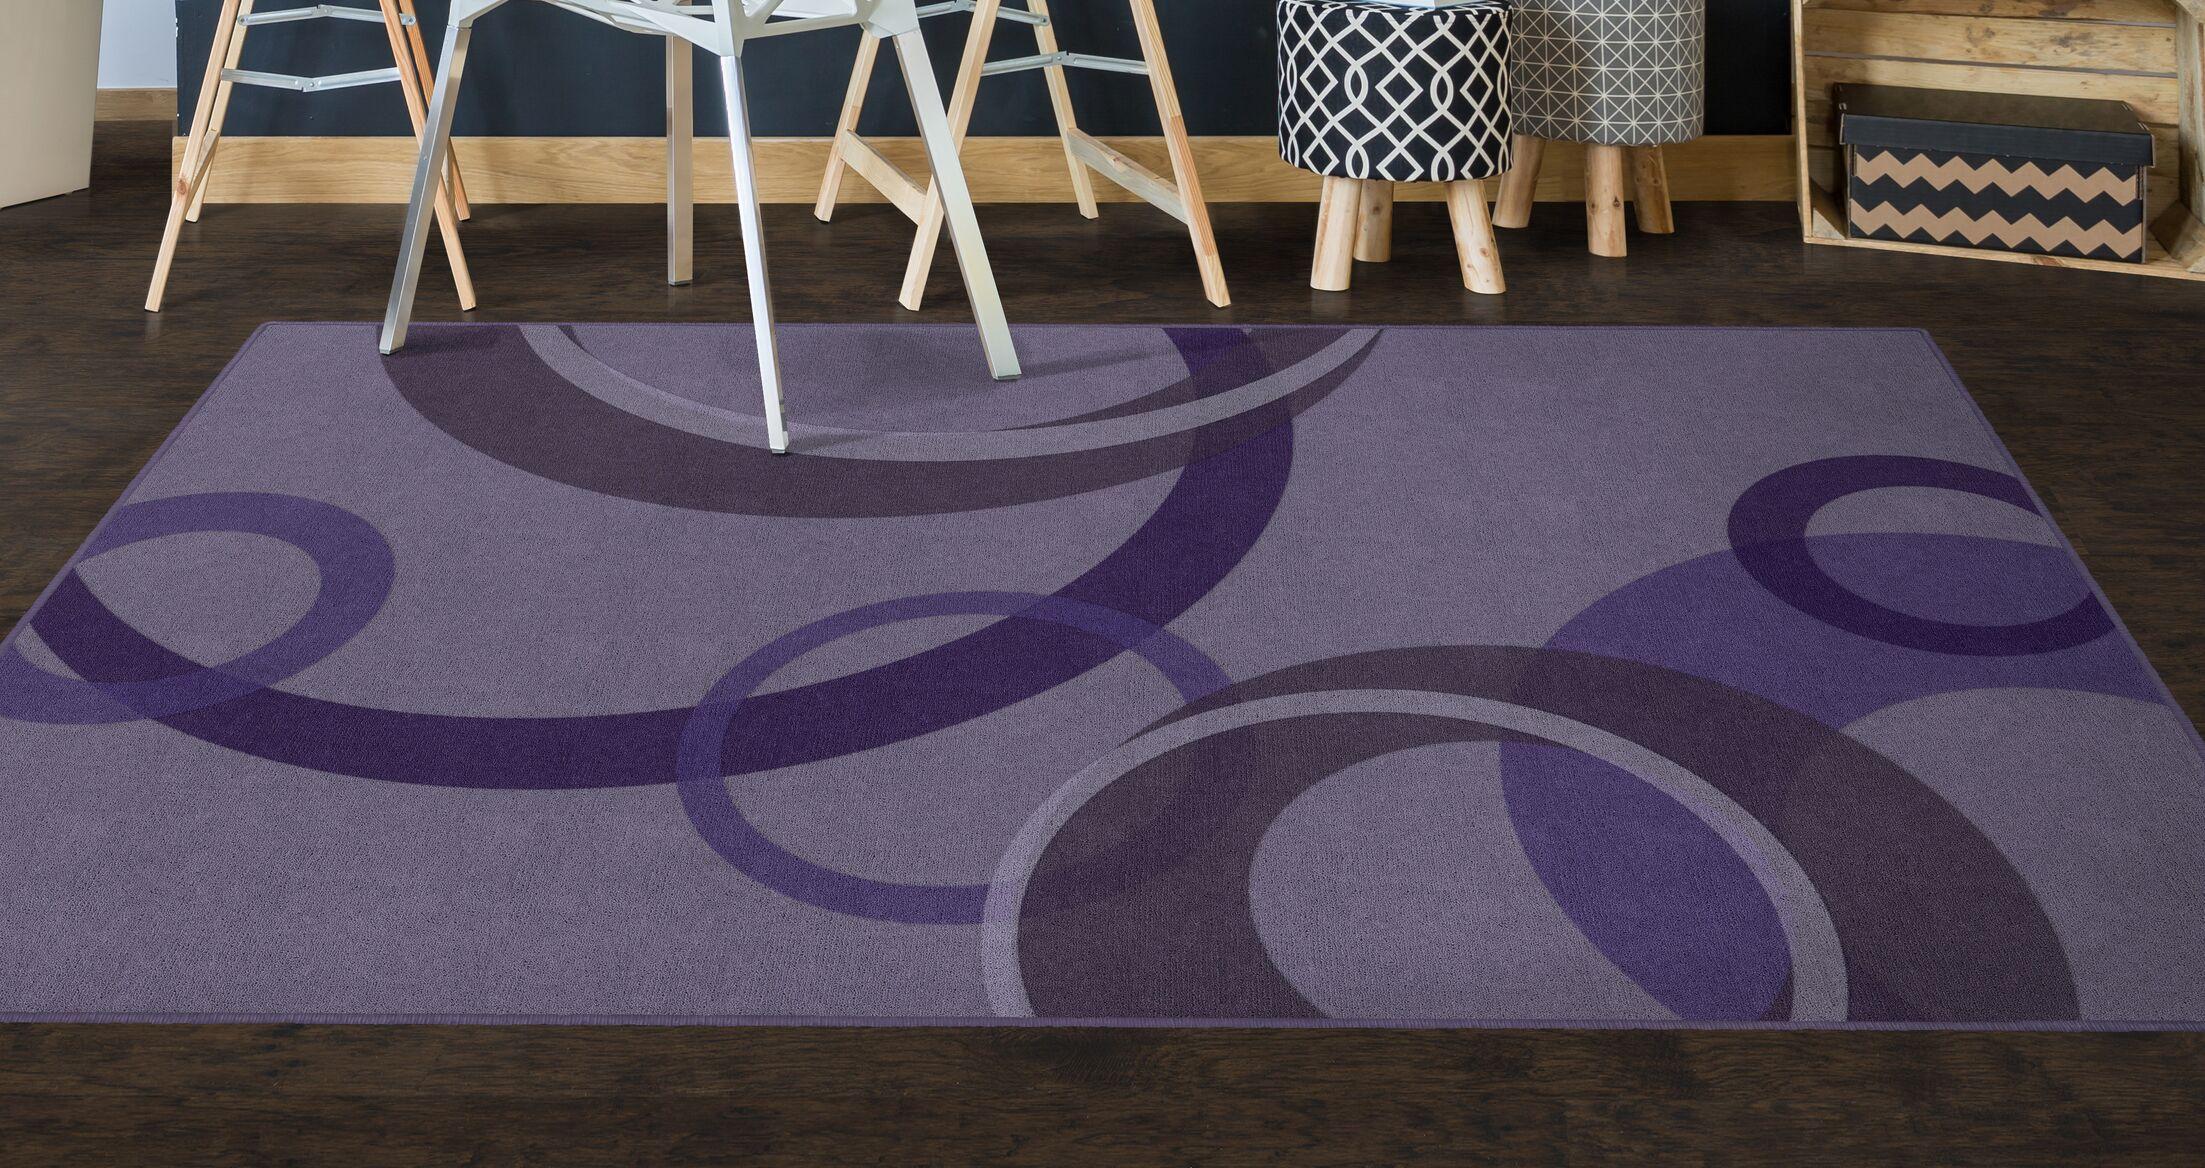 Jakarta Contemporary Geometric Purple Area Rug Rug Size: Rectangle 5' x 8'